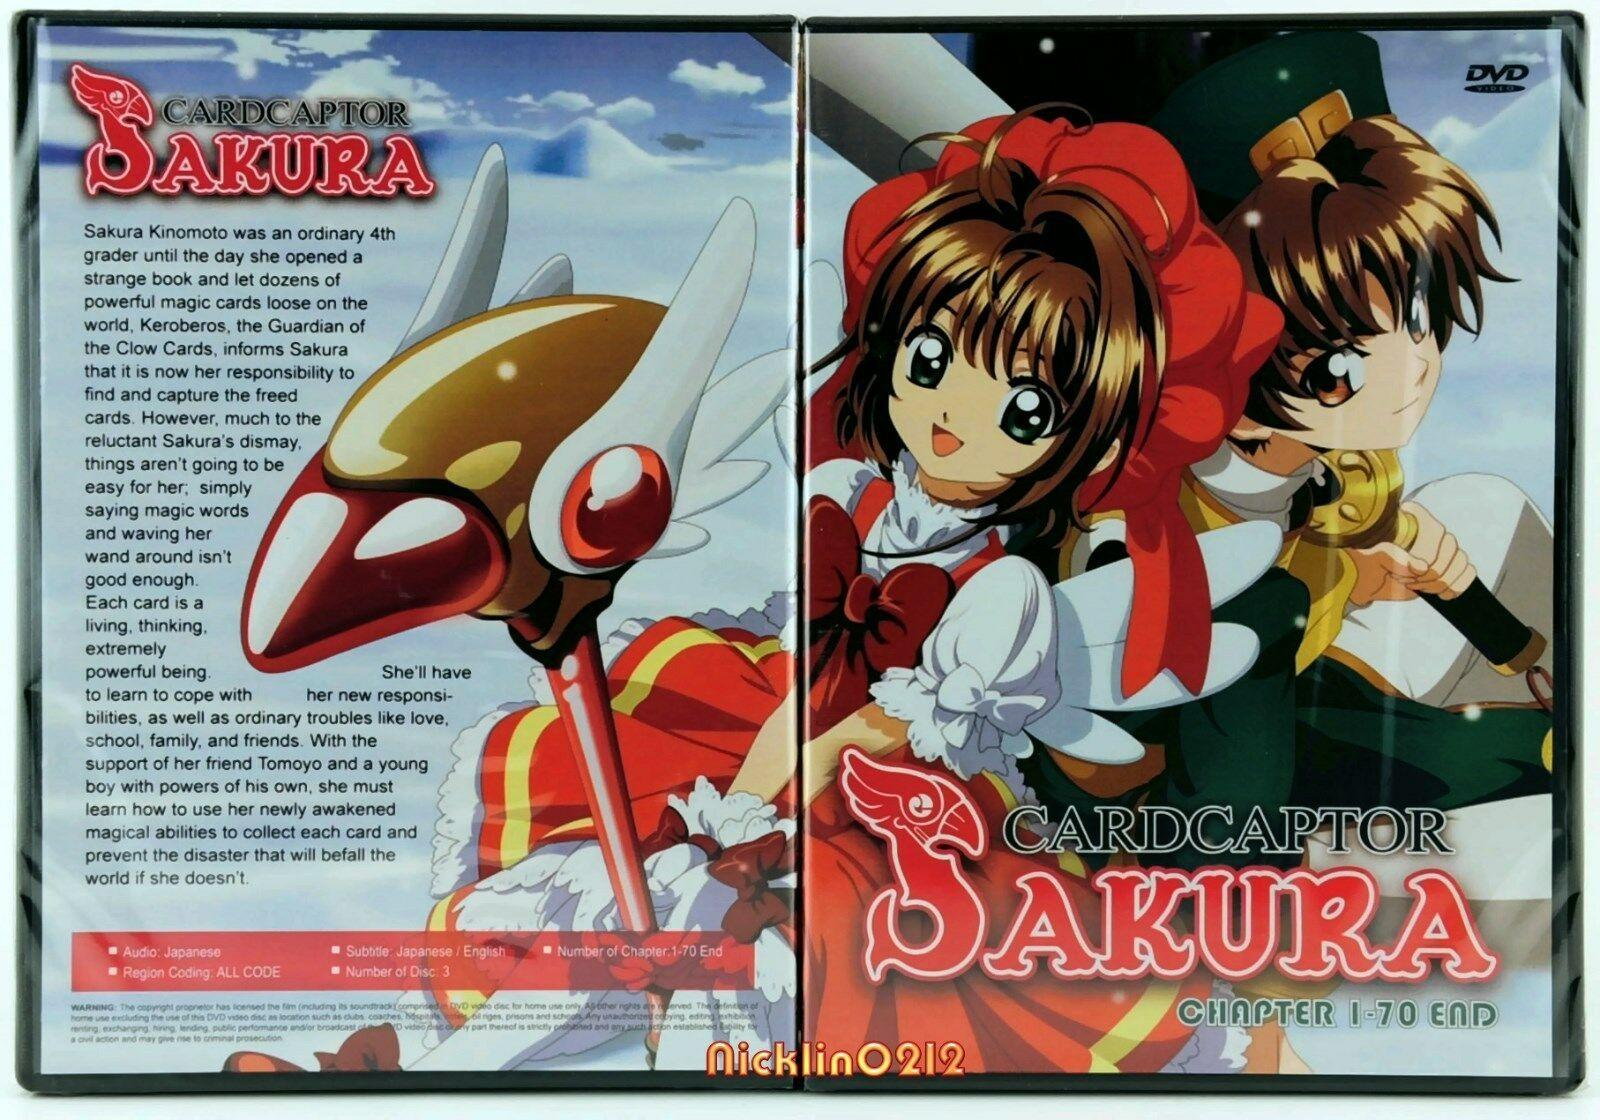 Cardcaptor Sakura Complete Anime 1 70 Tv Episodes Series